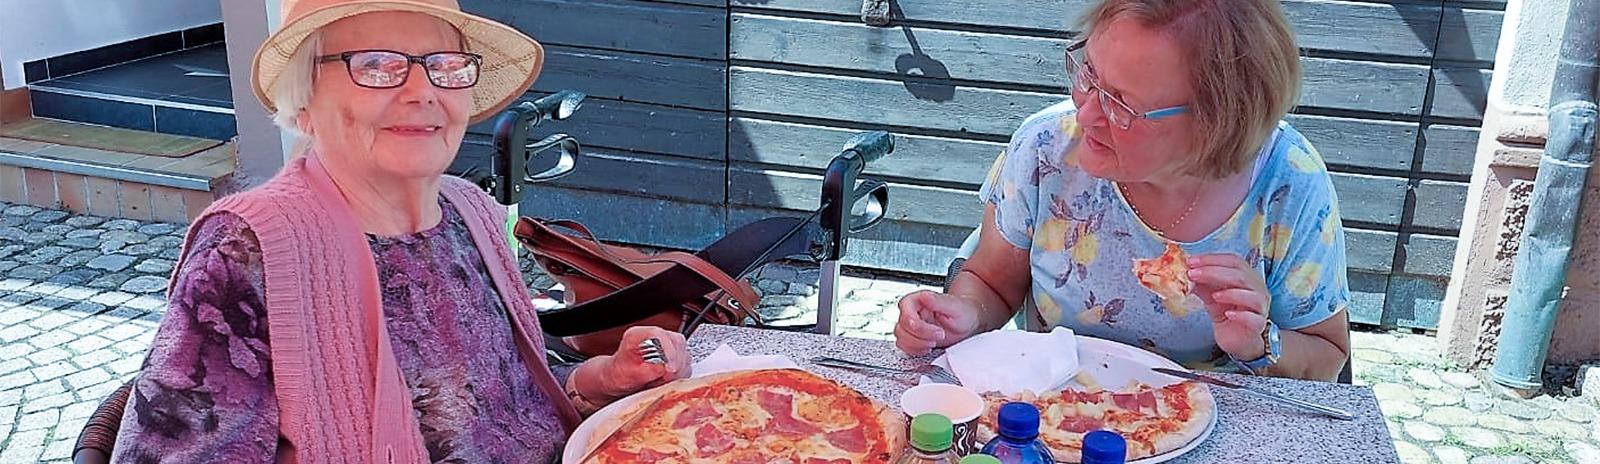 Haus St. Katharina_Pizza essen_slider